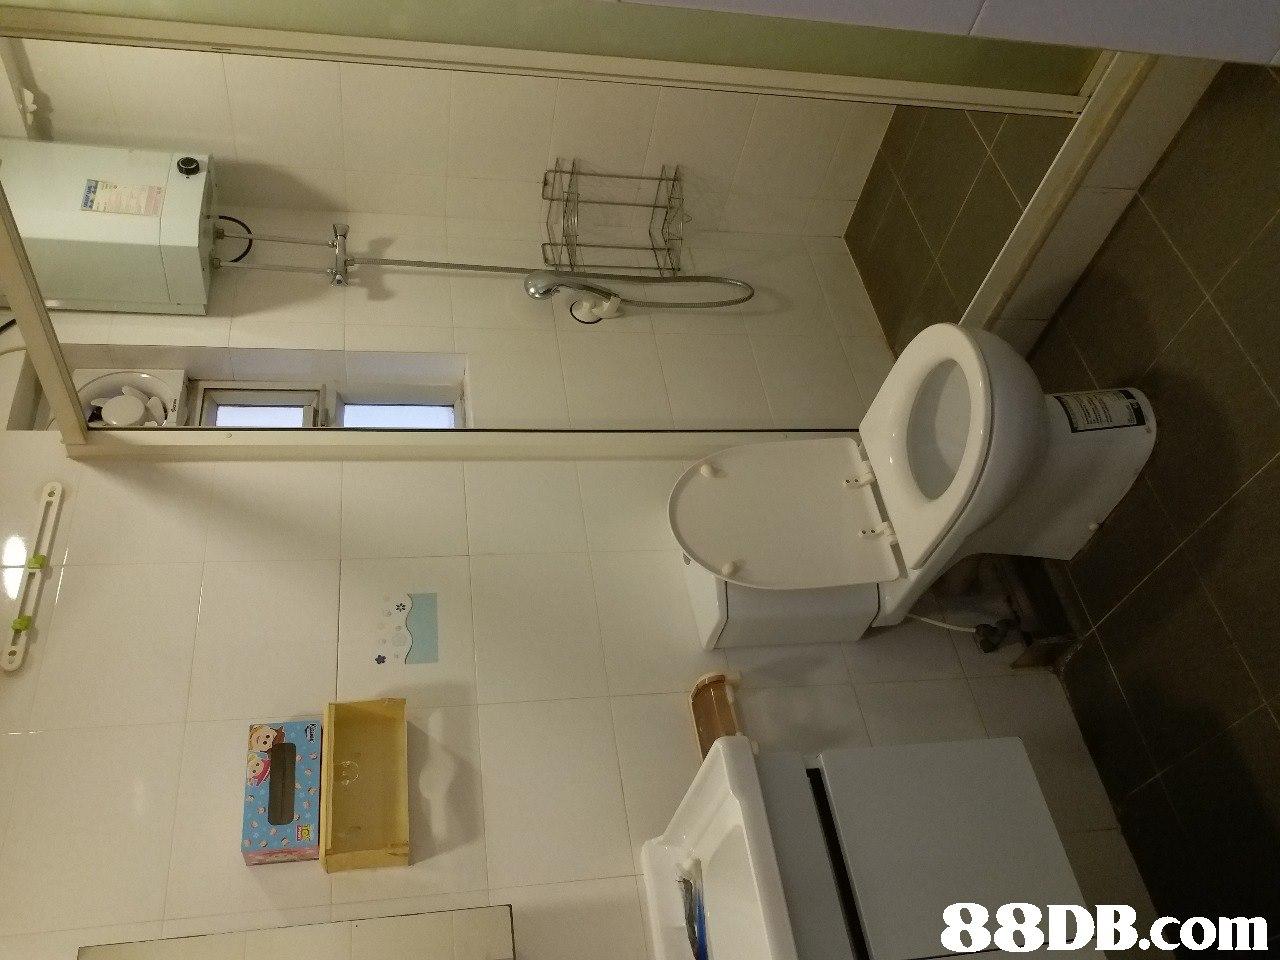 Property,Room,Bathroom,Shelf,Plumbing fixture